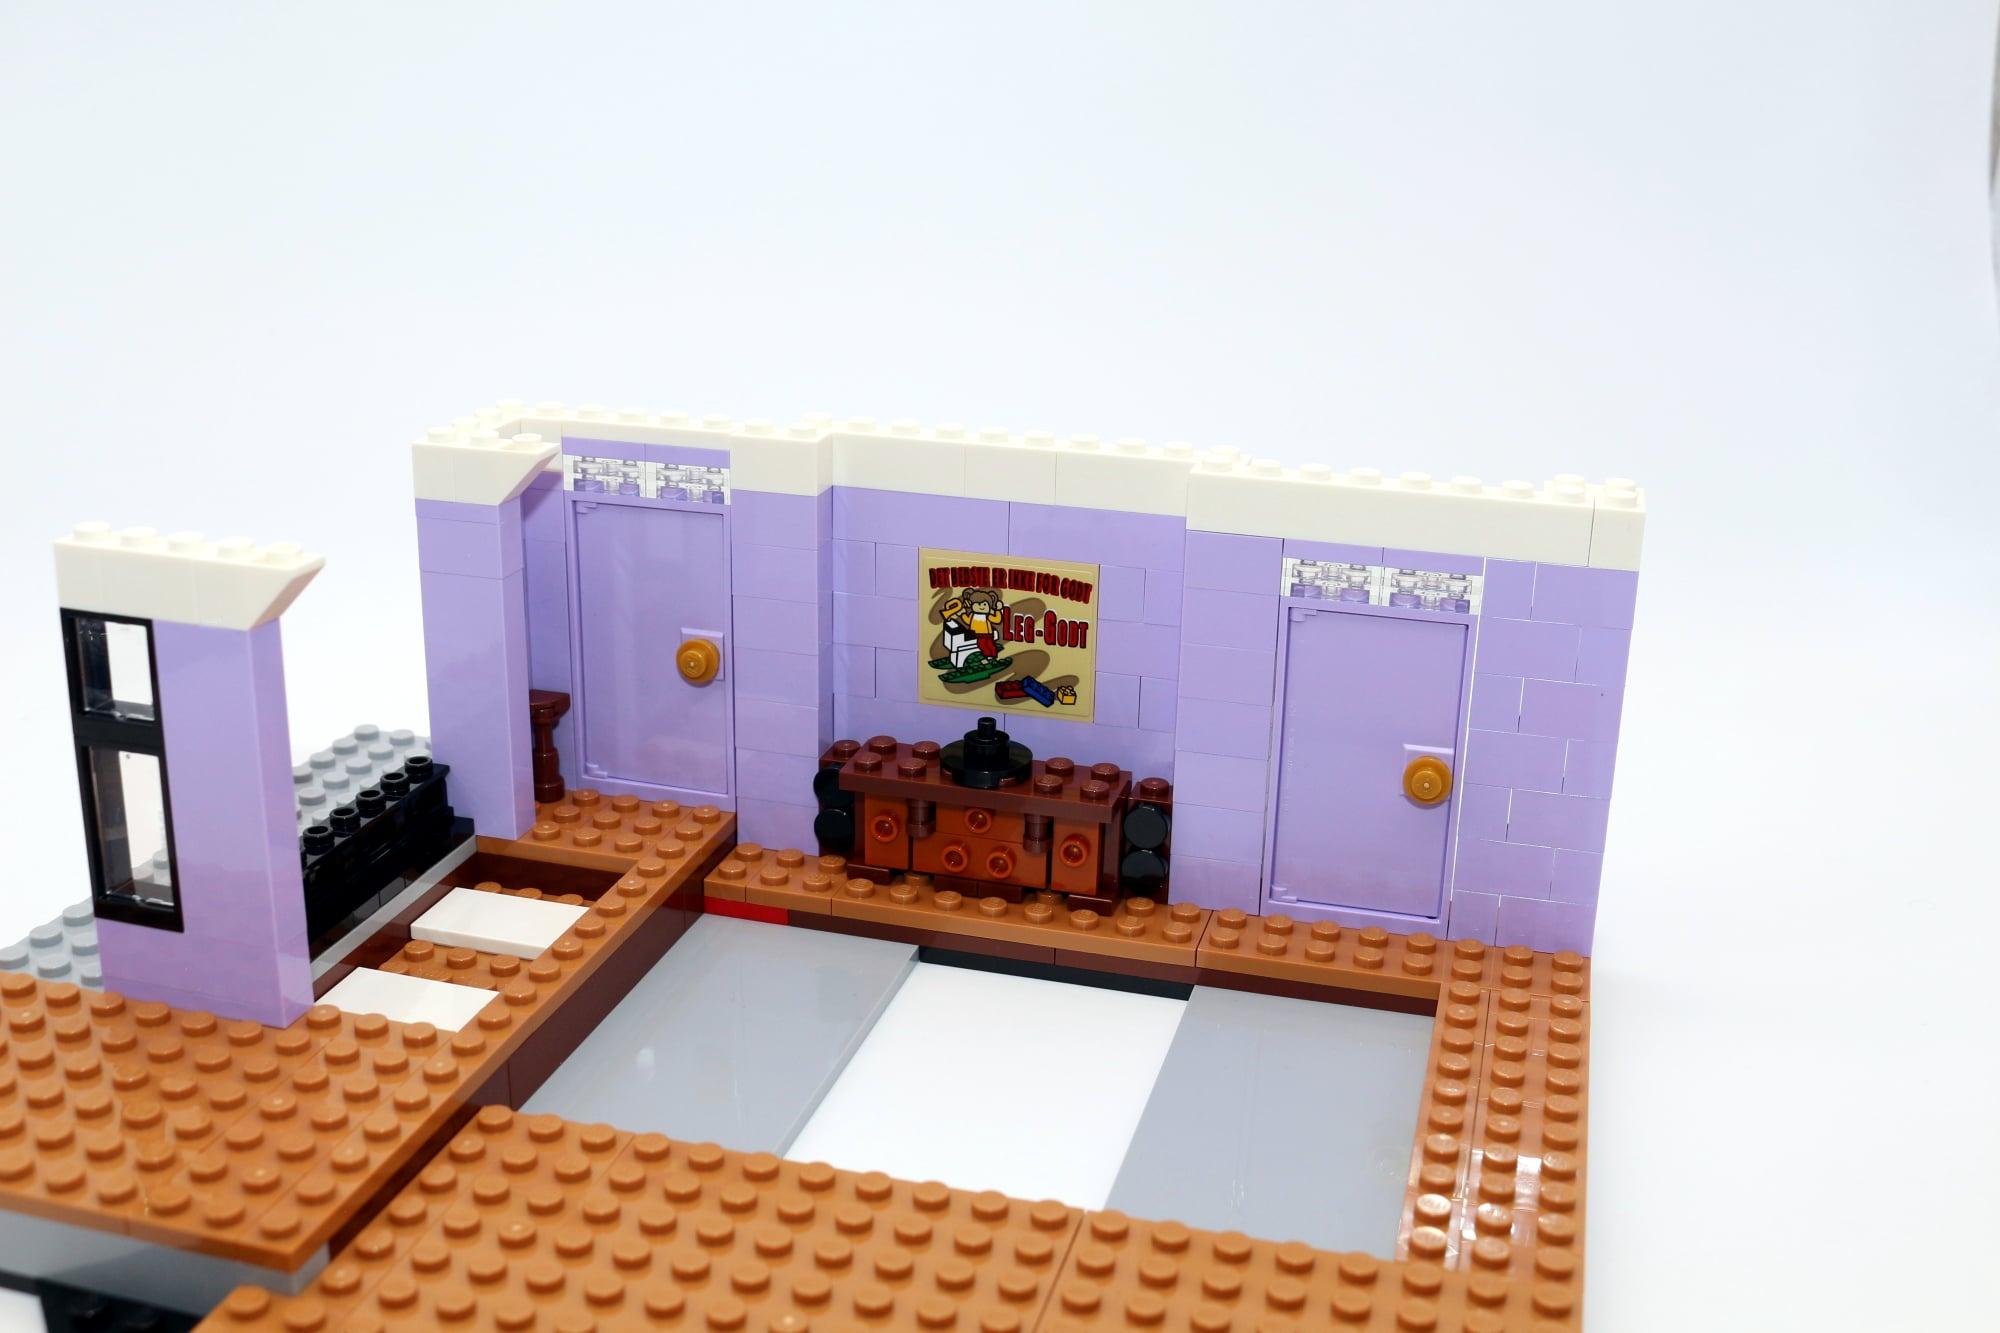 LEGO Friends 10292 The Friends Apartments 32